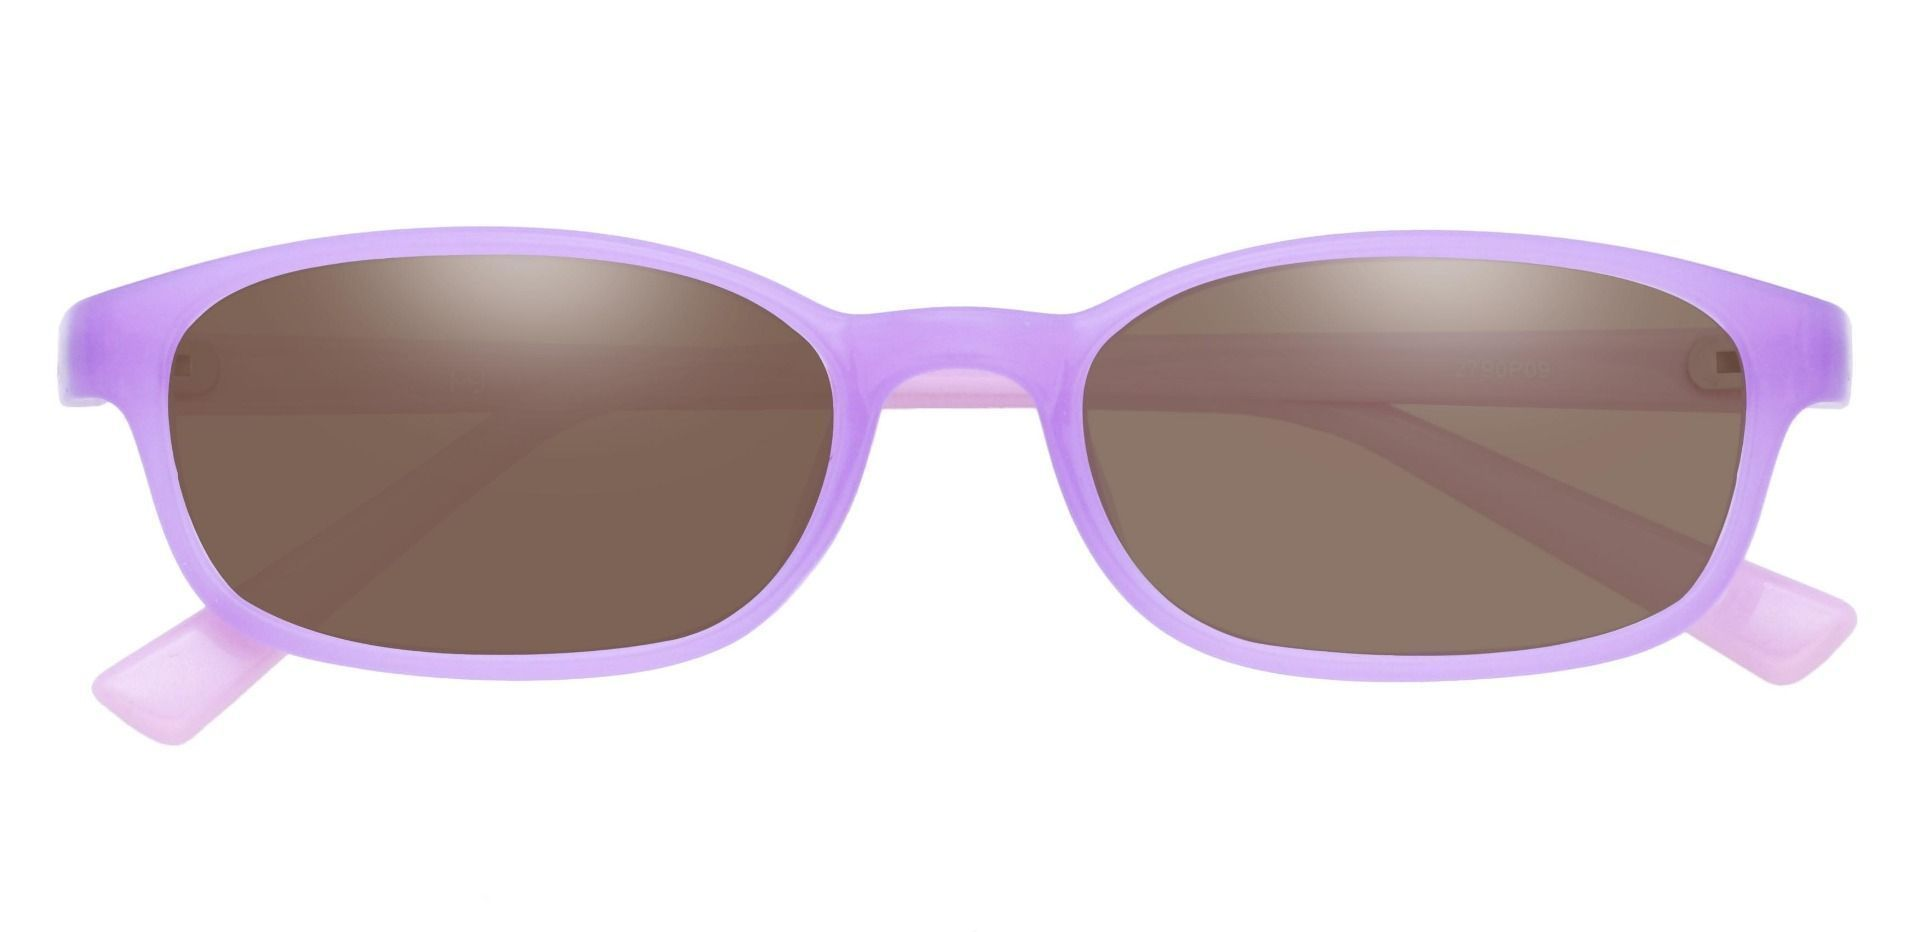 Kia Oval Single Vision Sunglasses -   Purple Frame With Brown Lenses